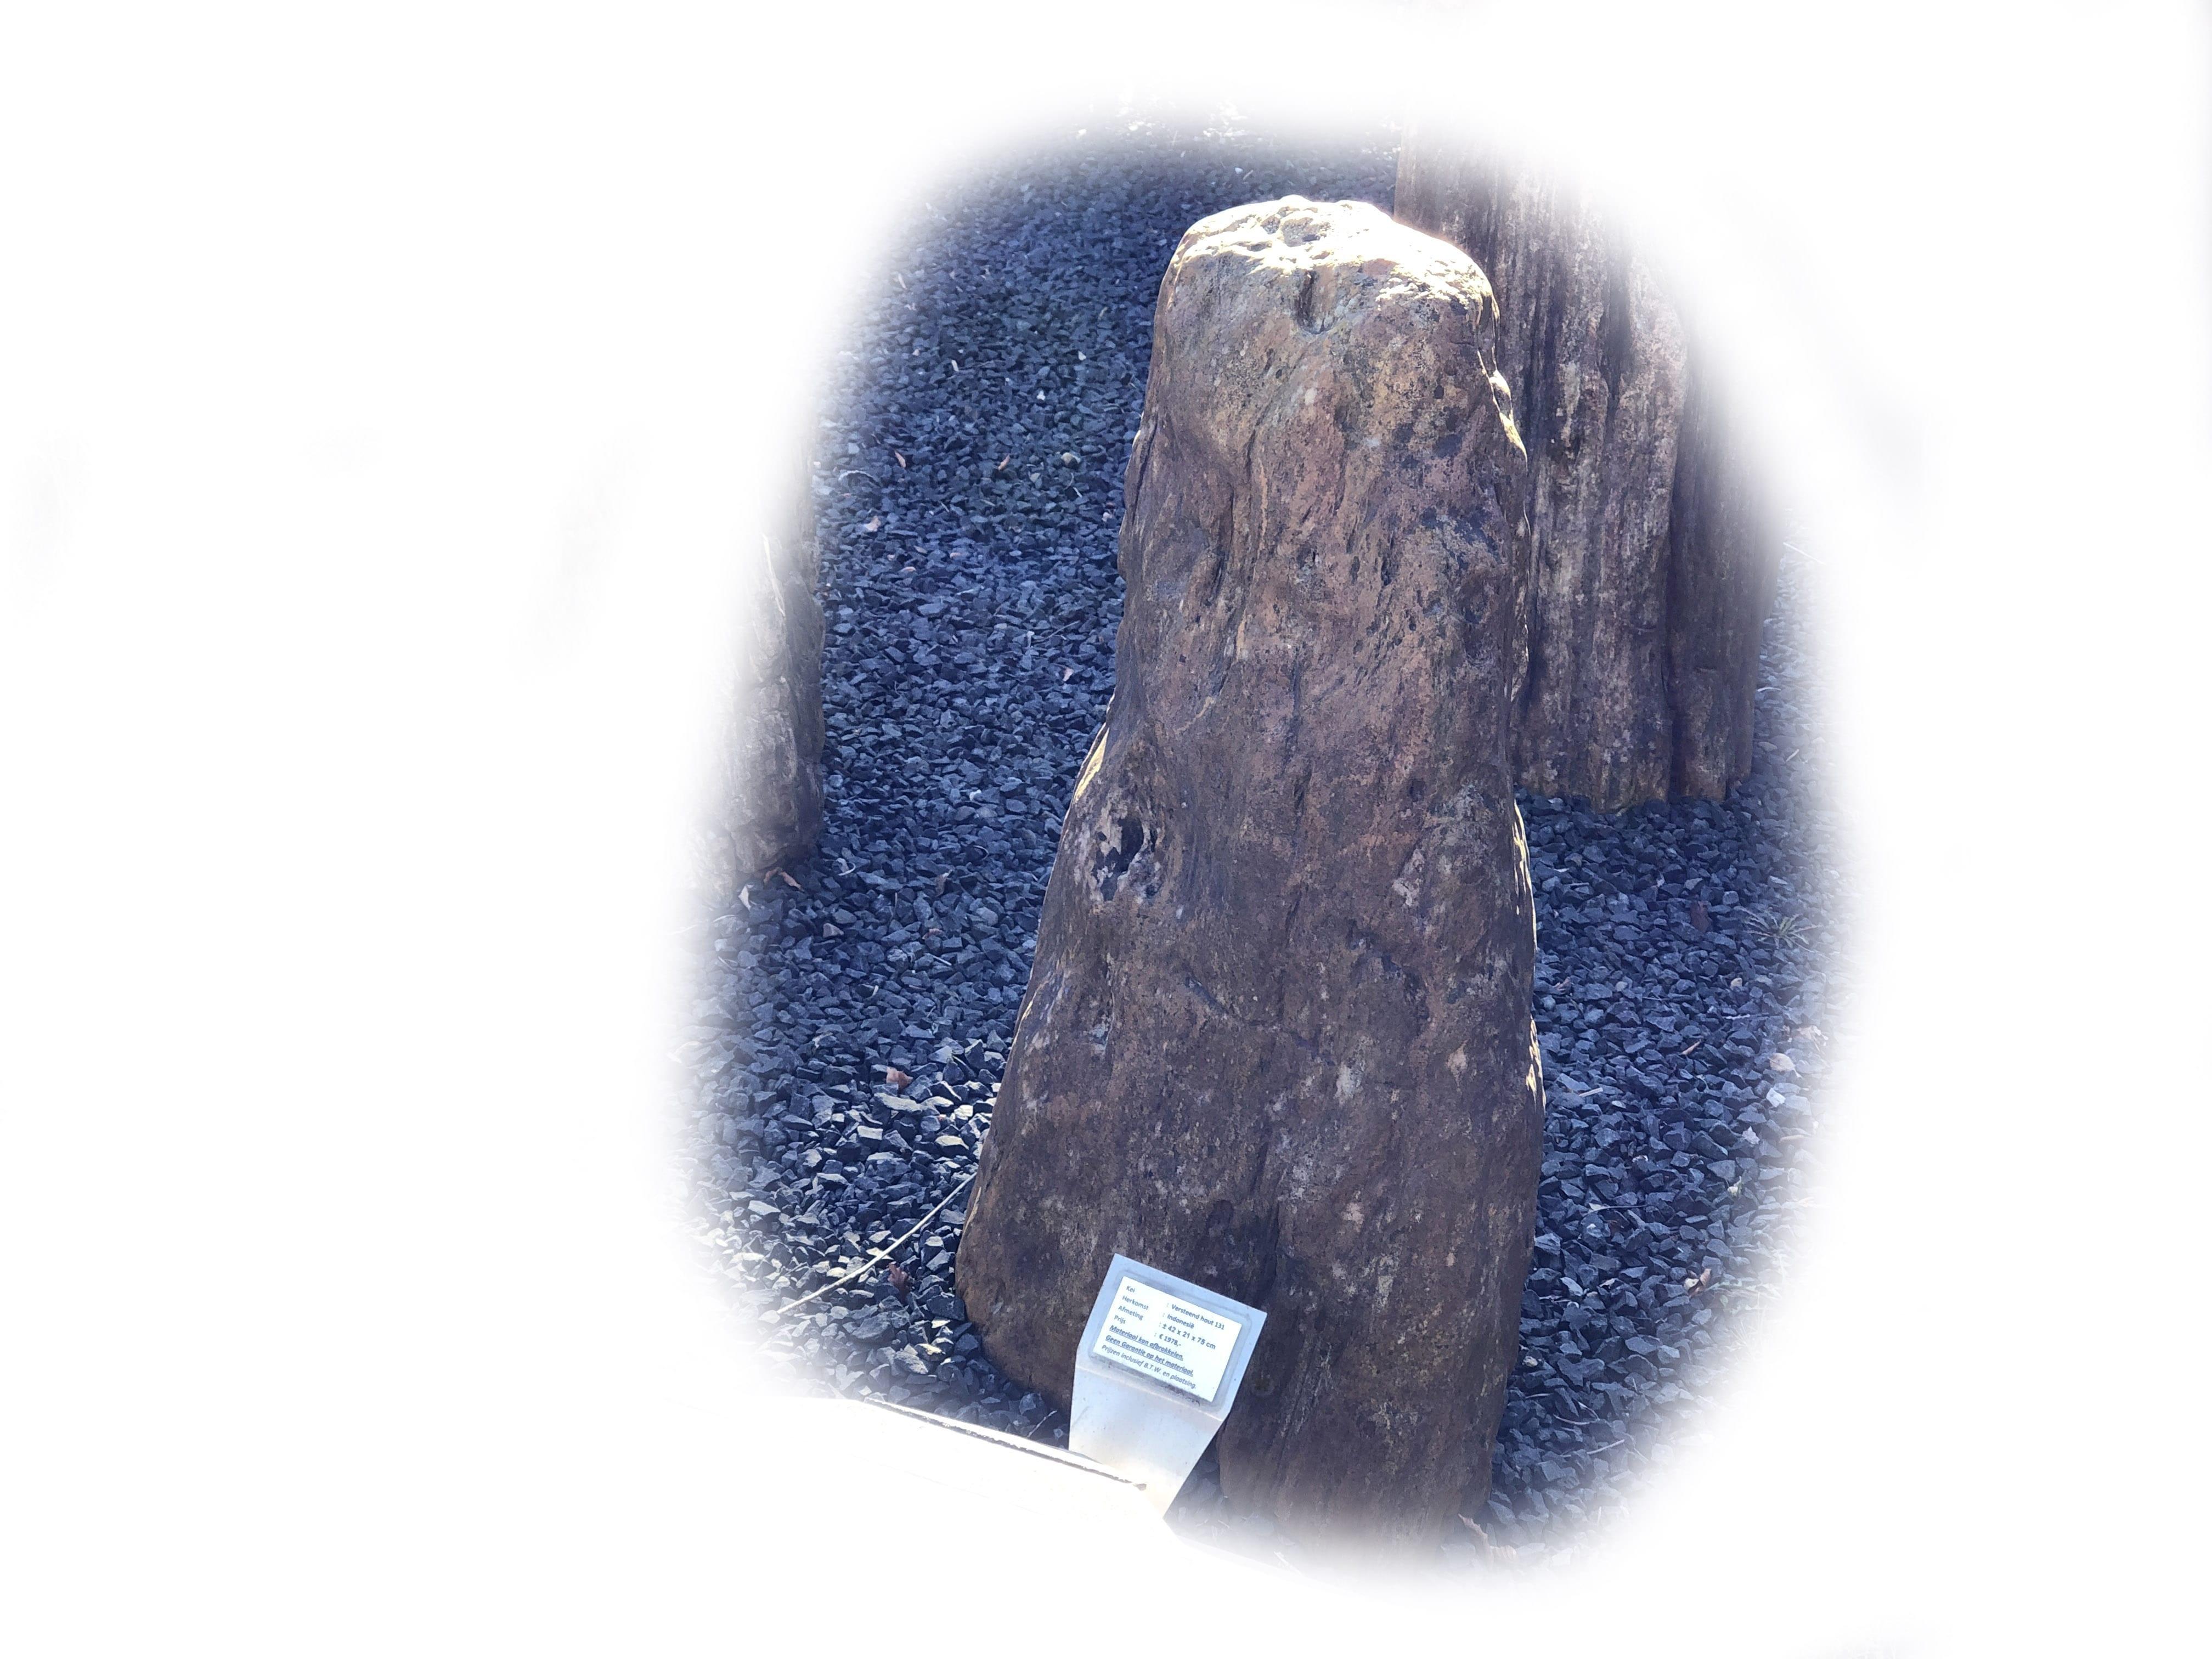 Versteend hout K-131